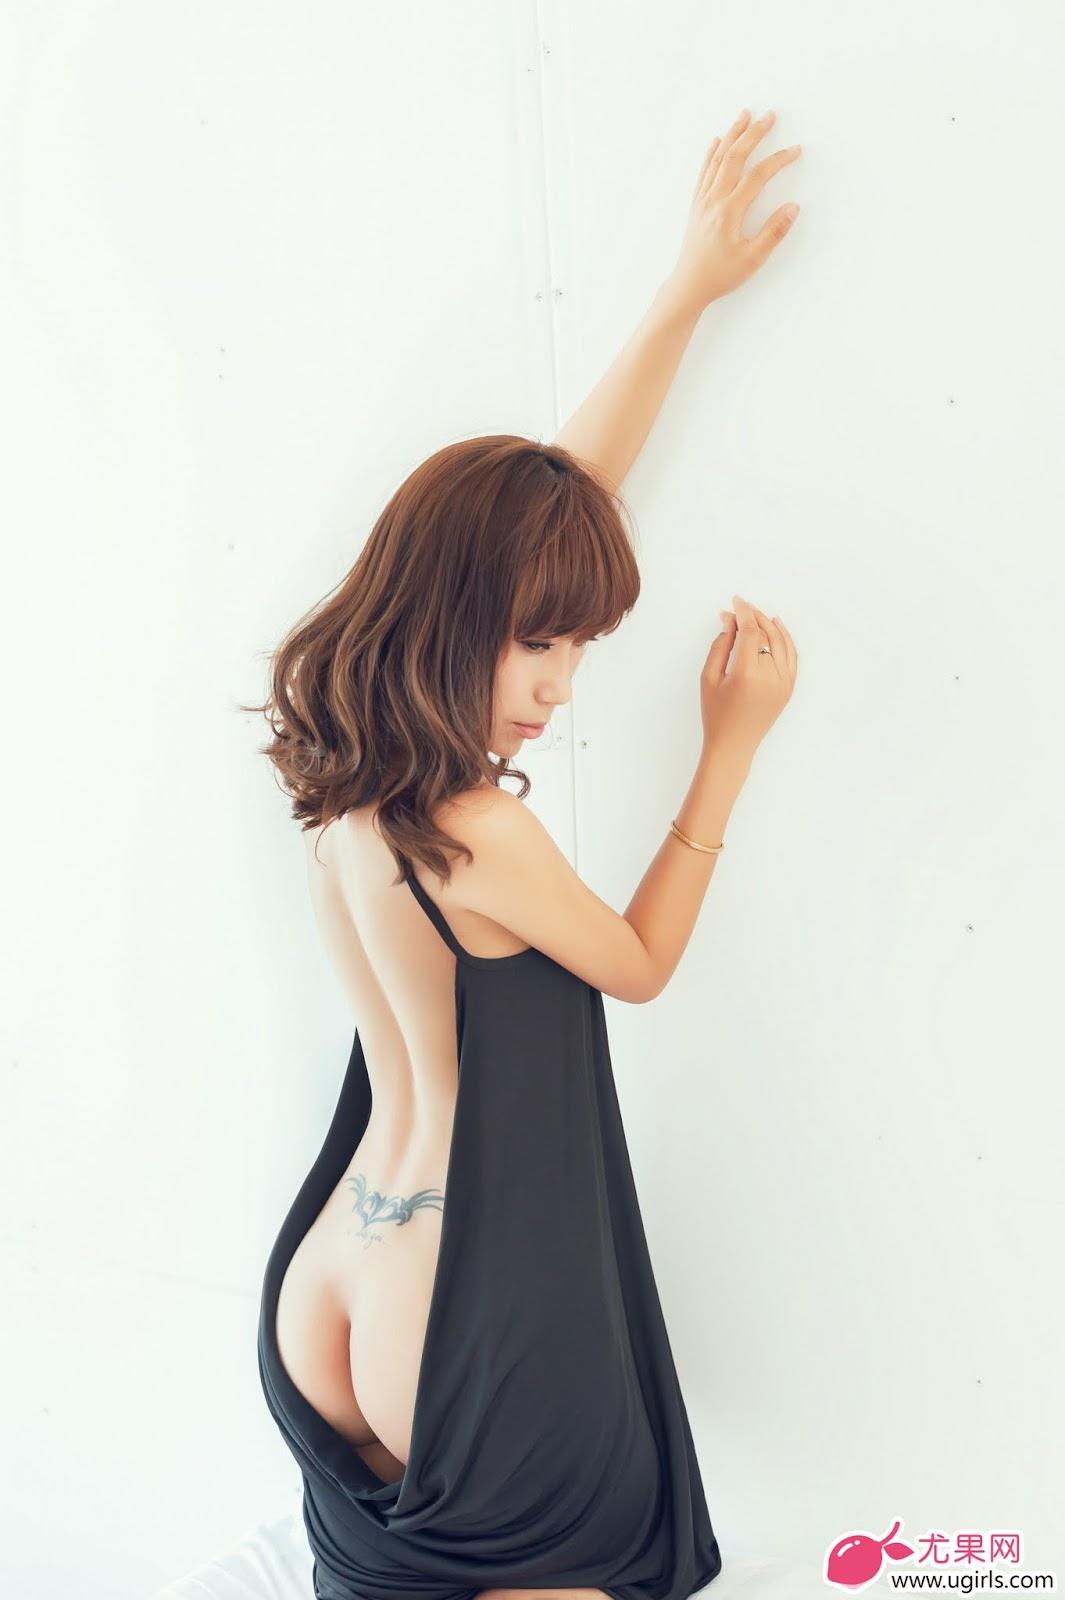 DLS 0173 - Hot Girl Ugirls No.021 Model: 田依依